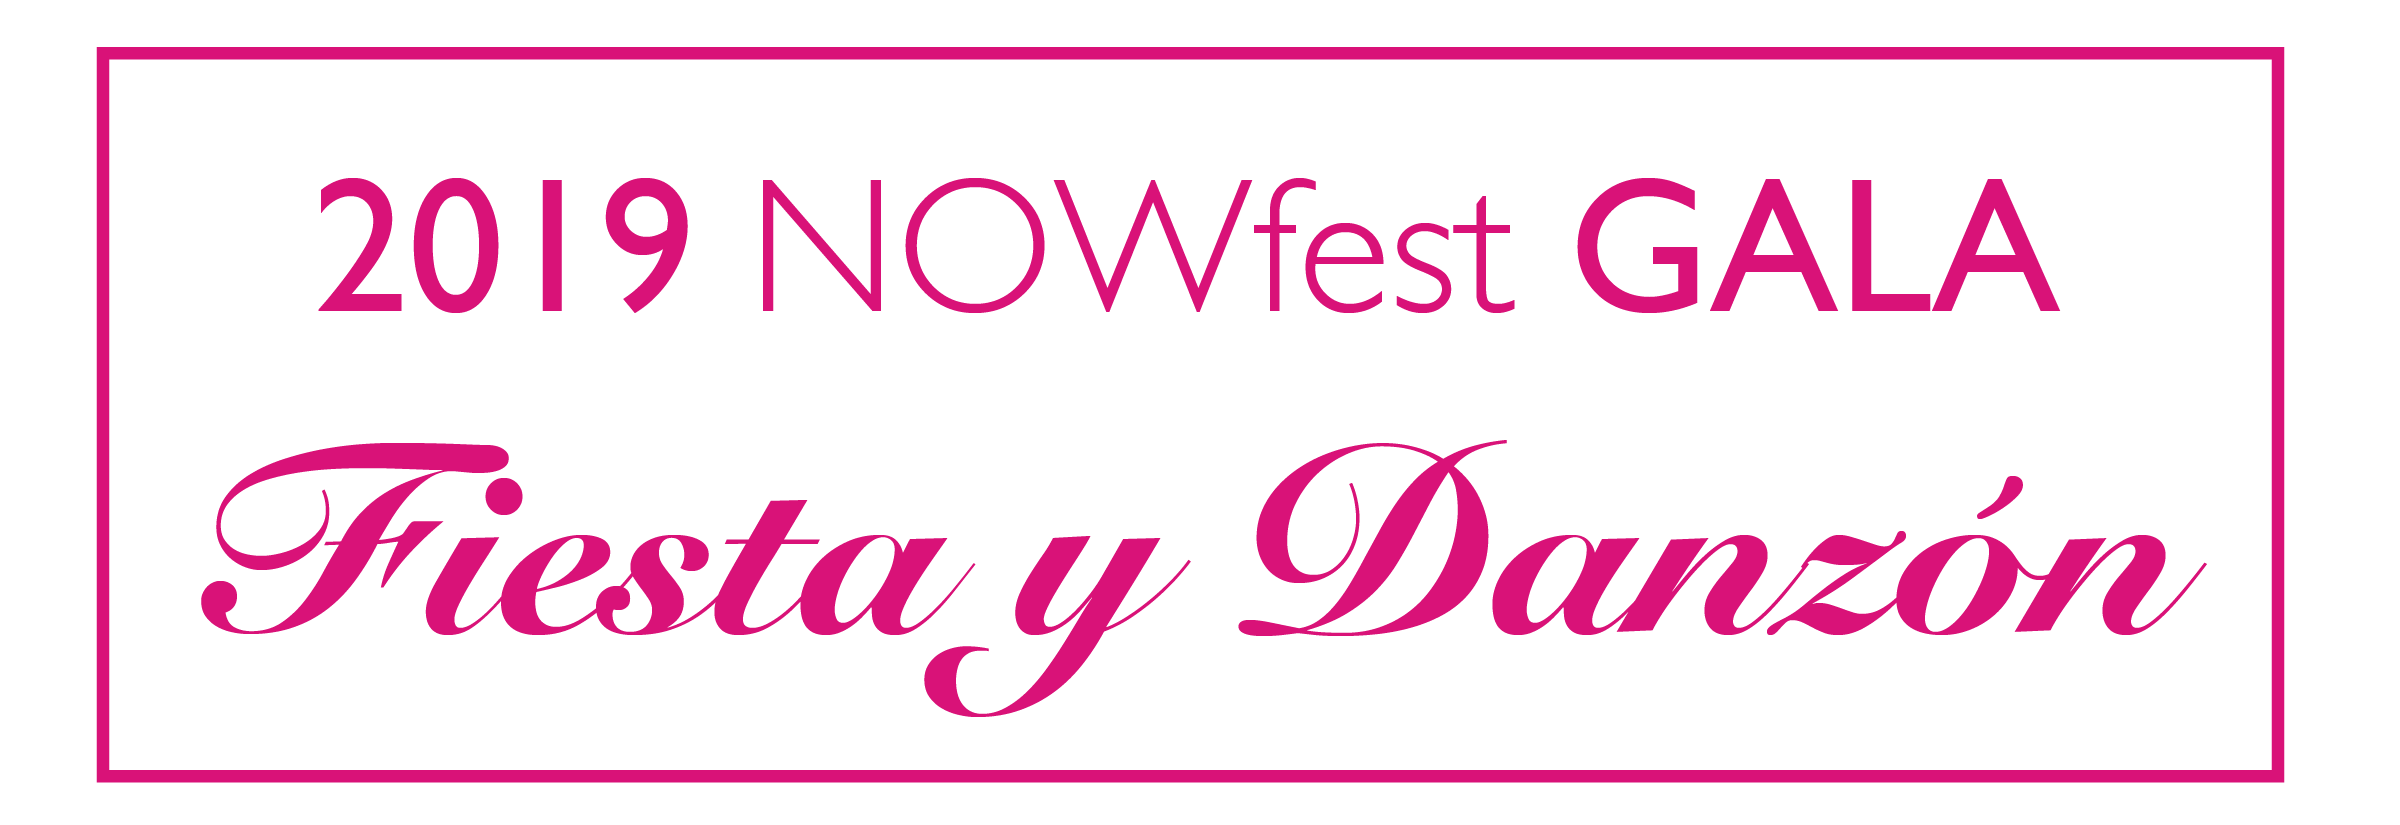 2019_NOWfest_Danzon-Rosa.png